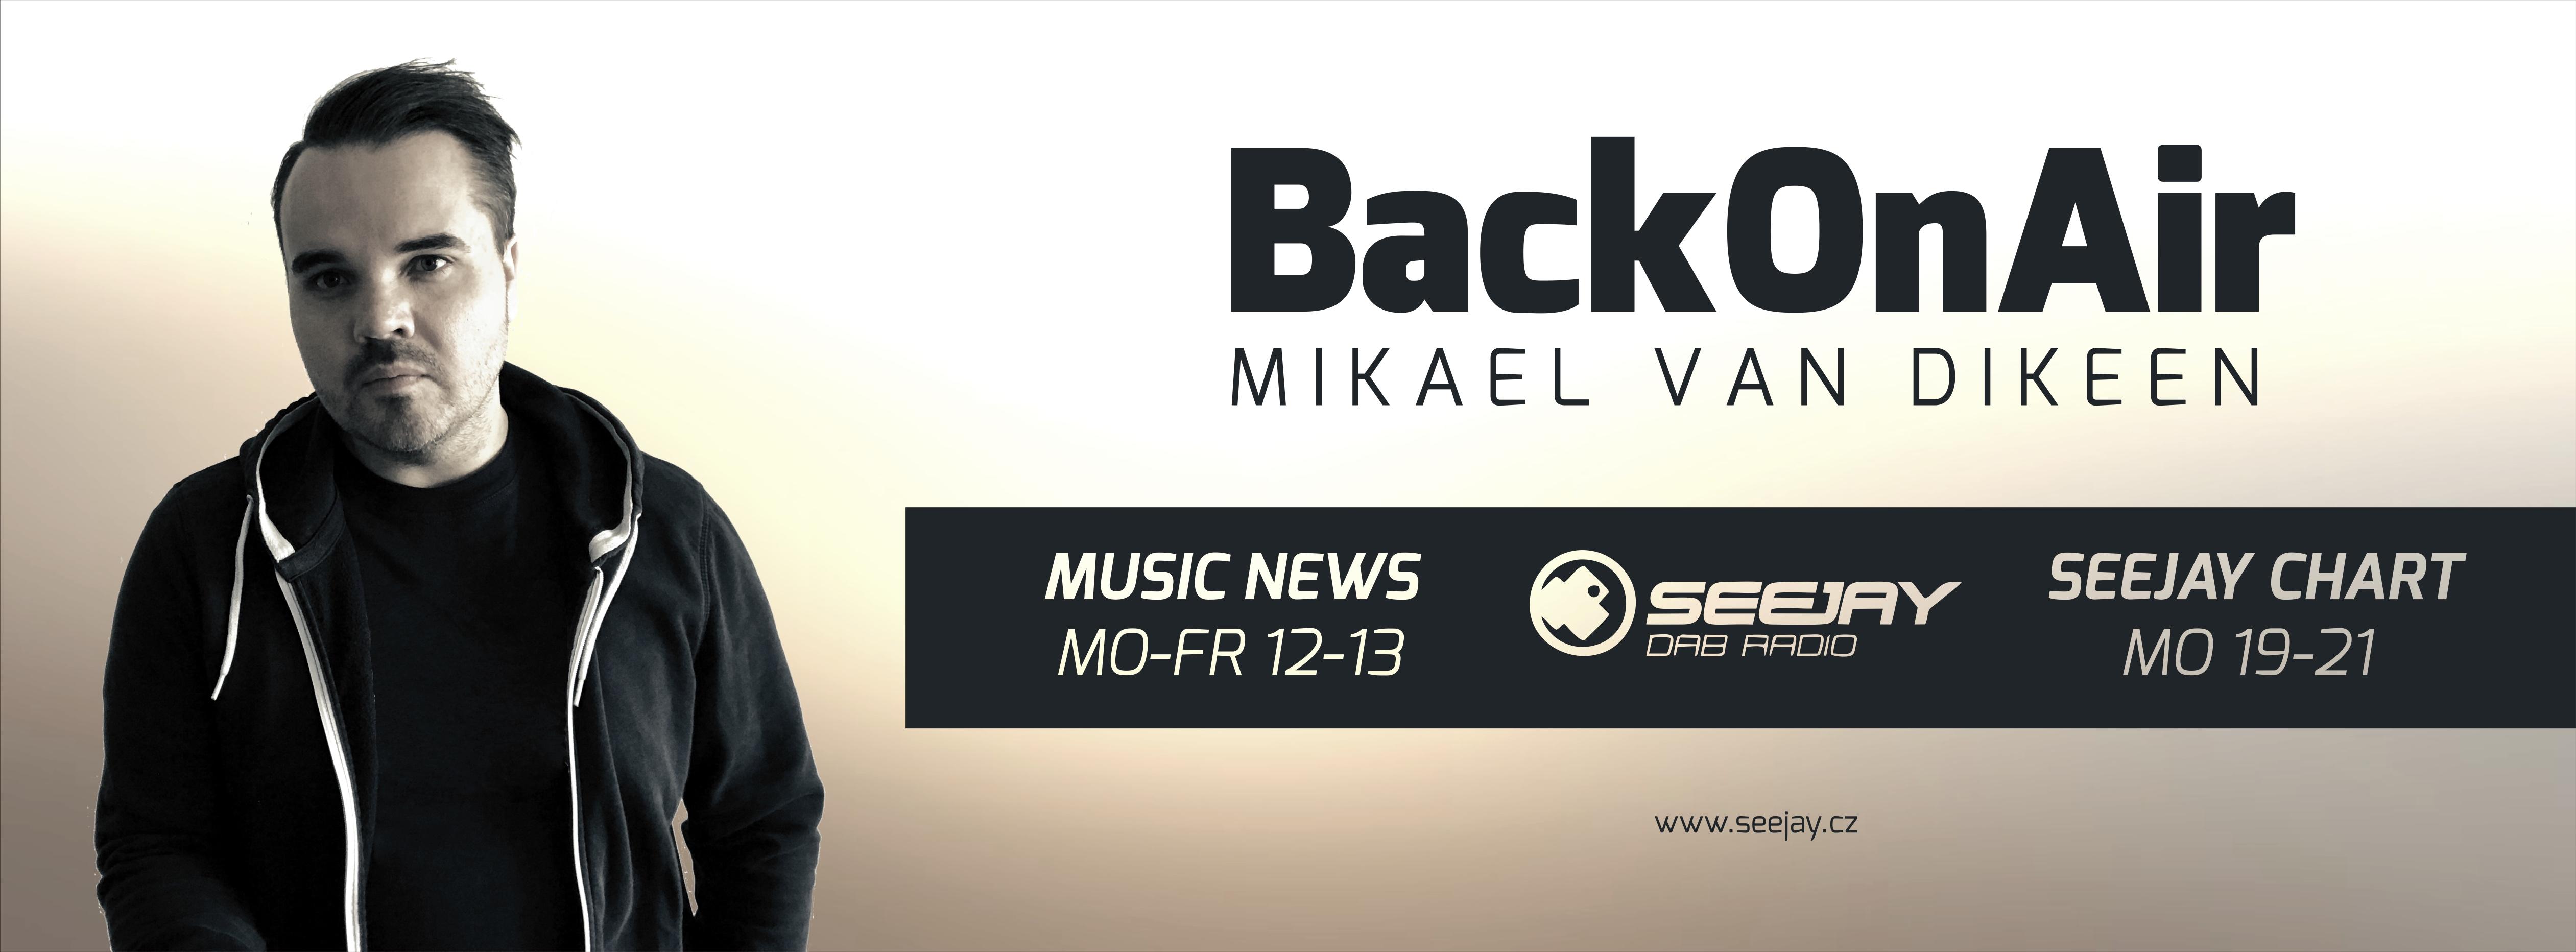 Mikael van Dikeen - back on air - seejay radio